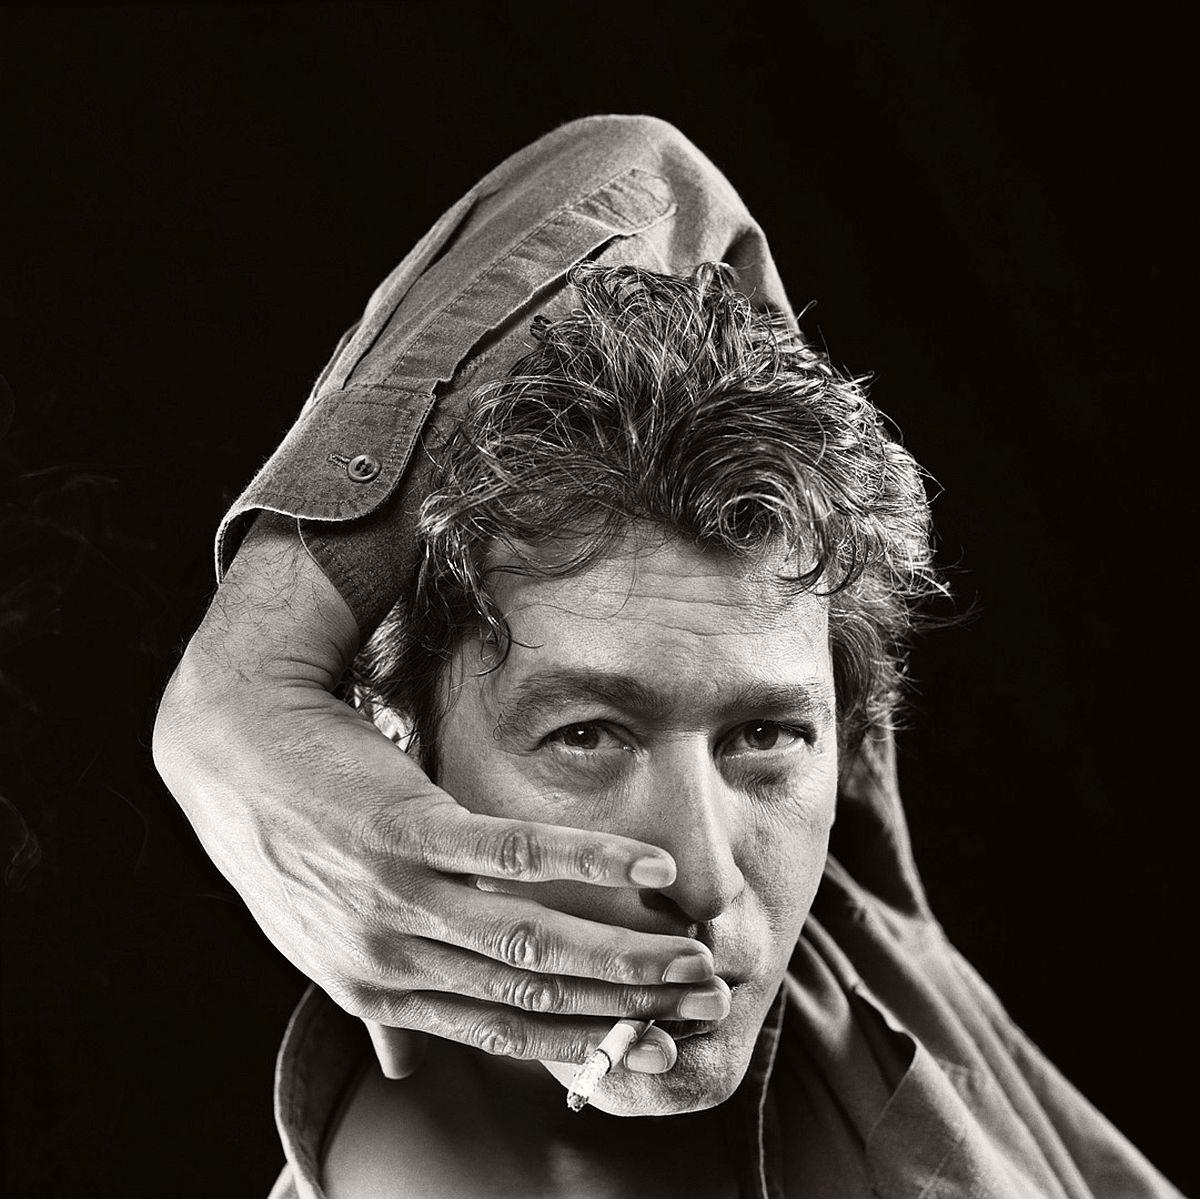 © Antoine Le Grand: Portraits